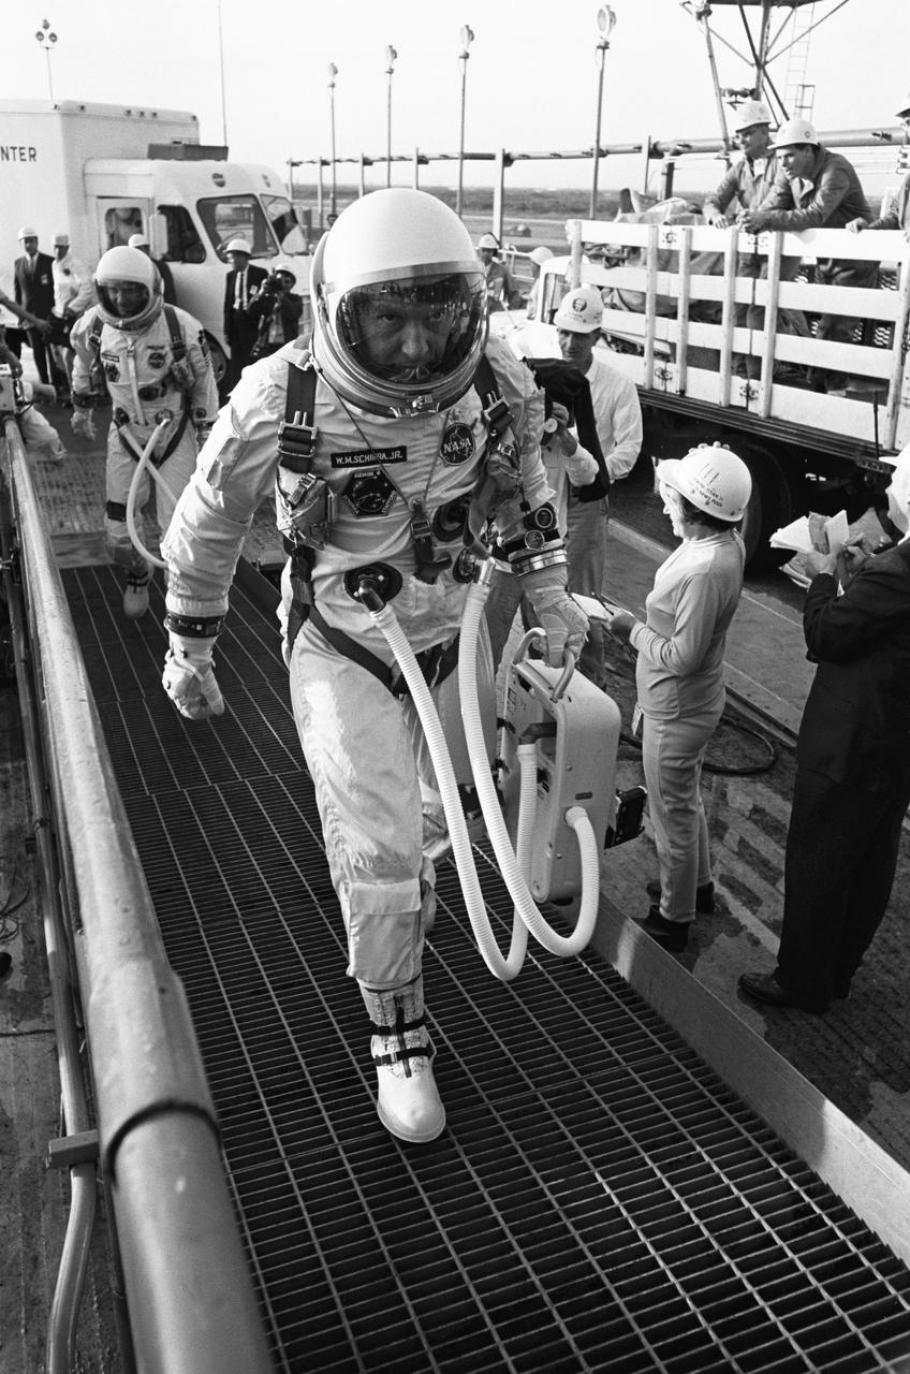 Gemini VI command pilot Wally Schirra and pilot Thomas Stafford arrive at Pad 19.